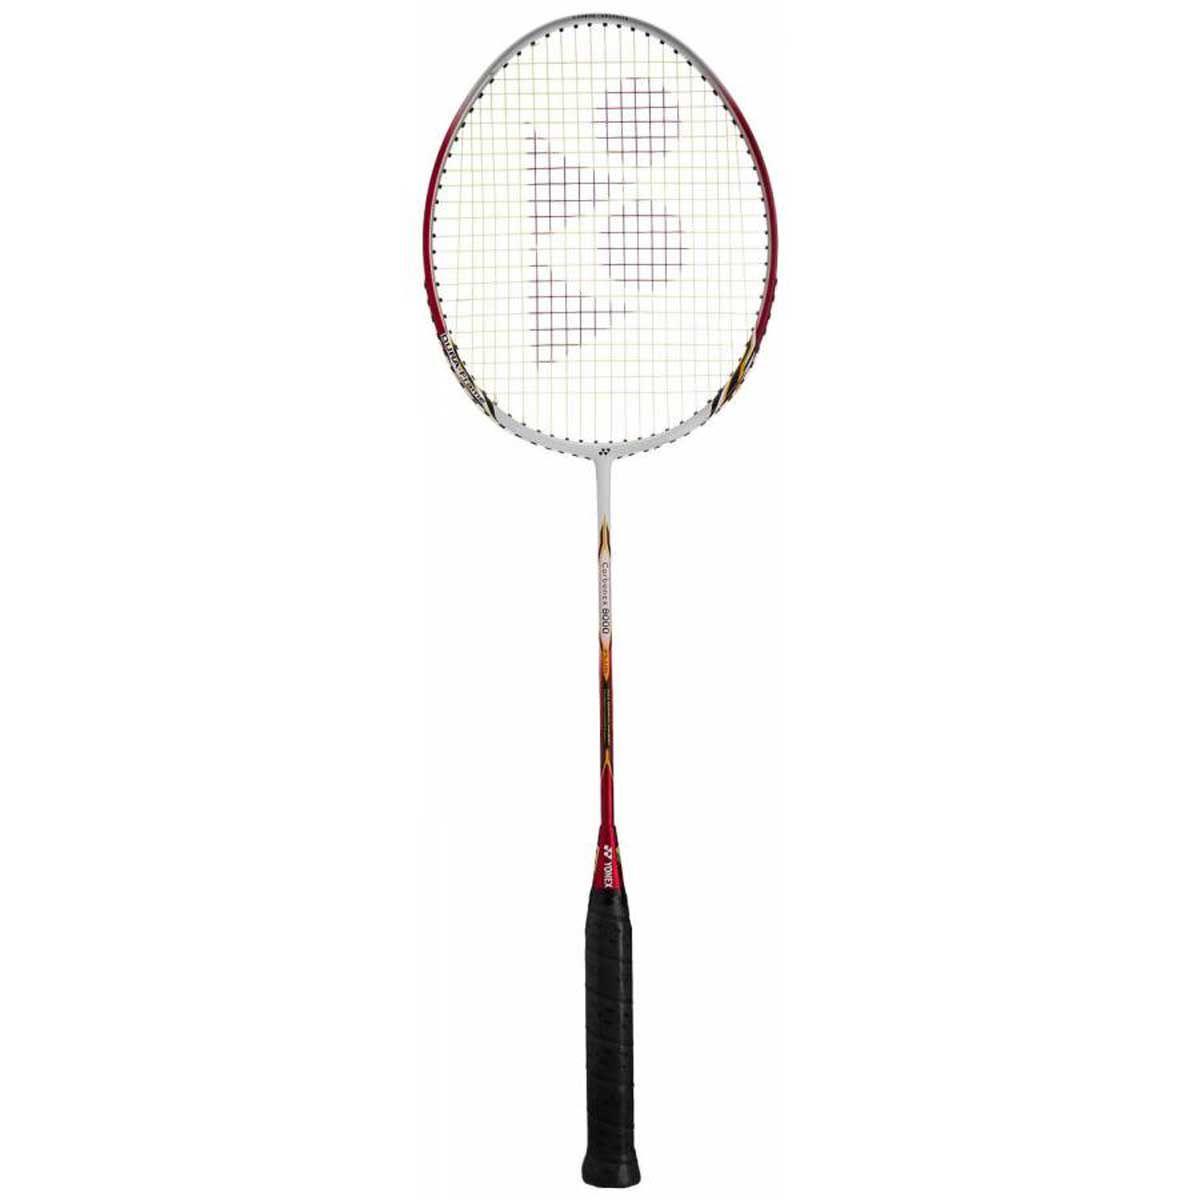 Yonex Carbonex 8000 Plus Badminton Racket: Buy Online at ...